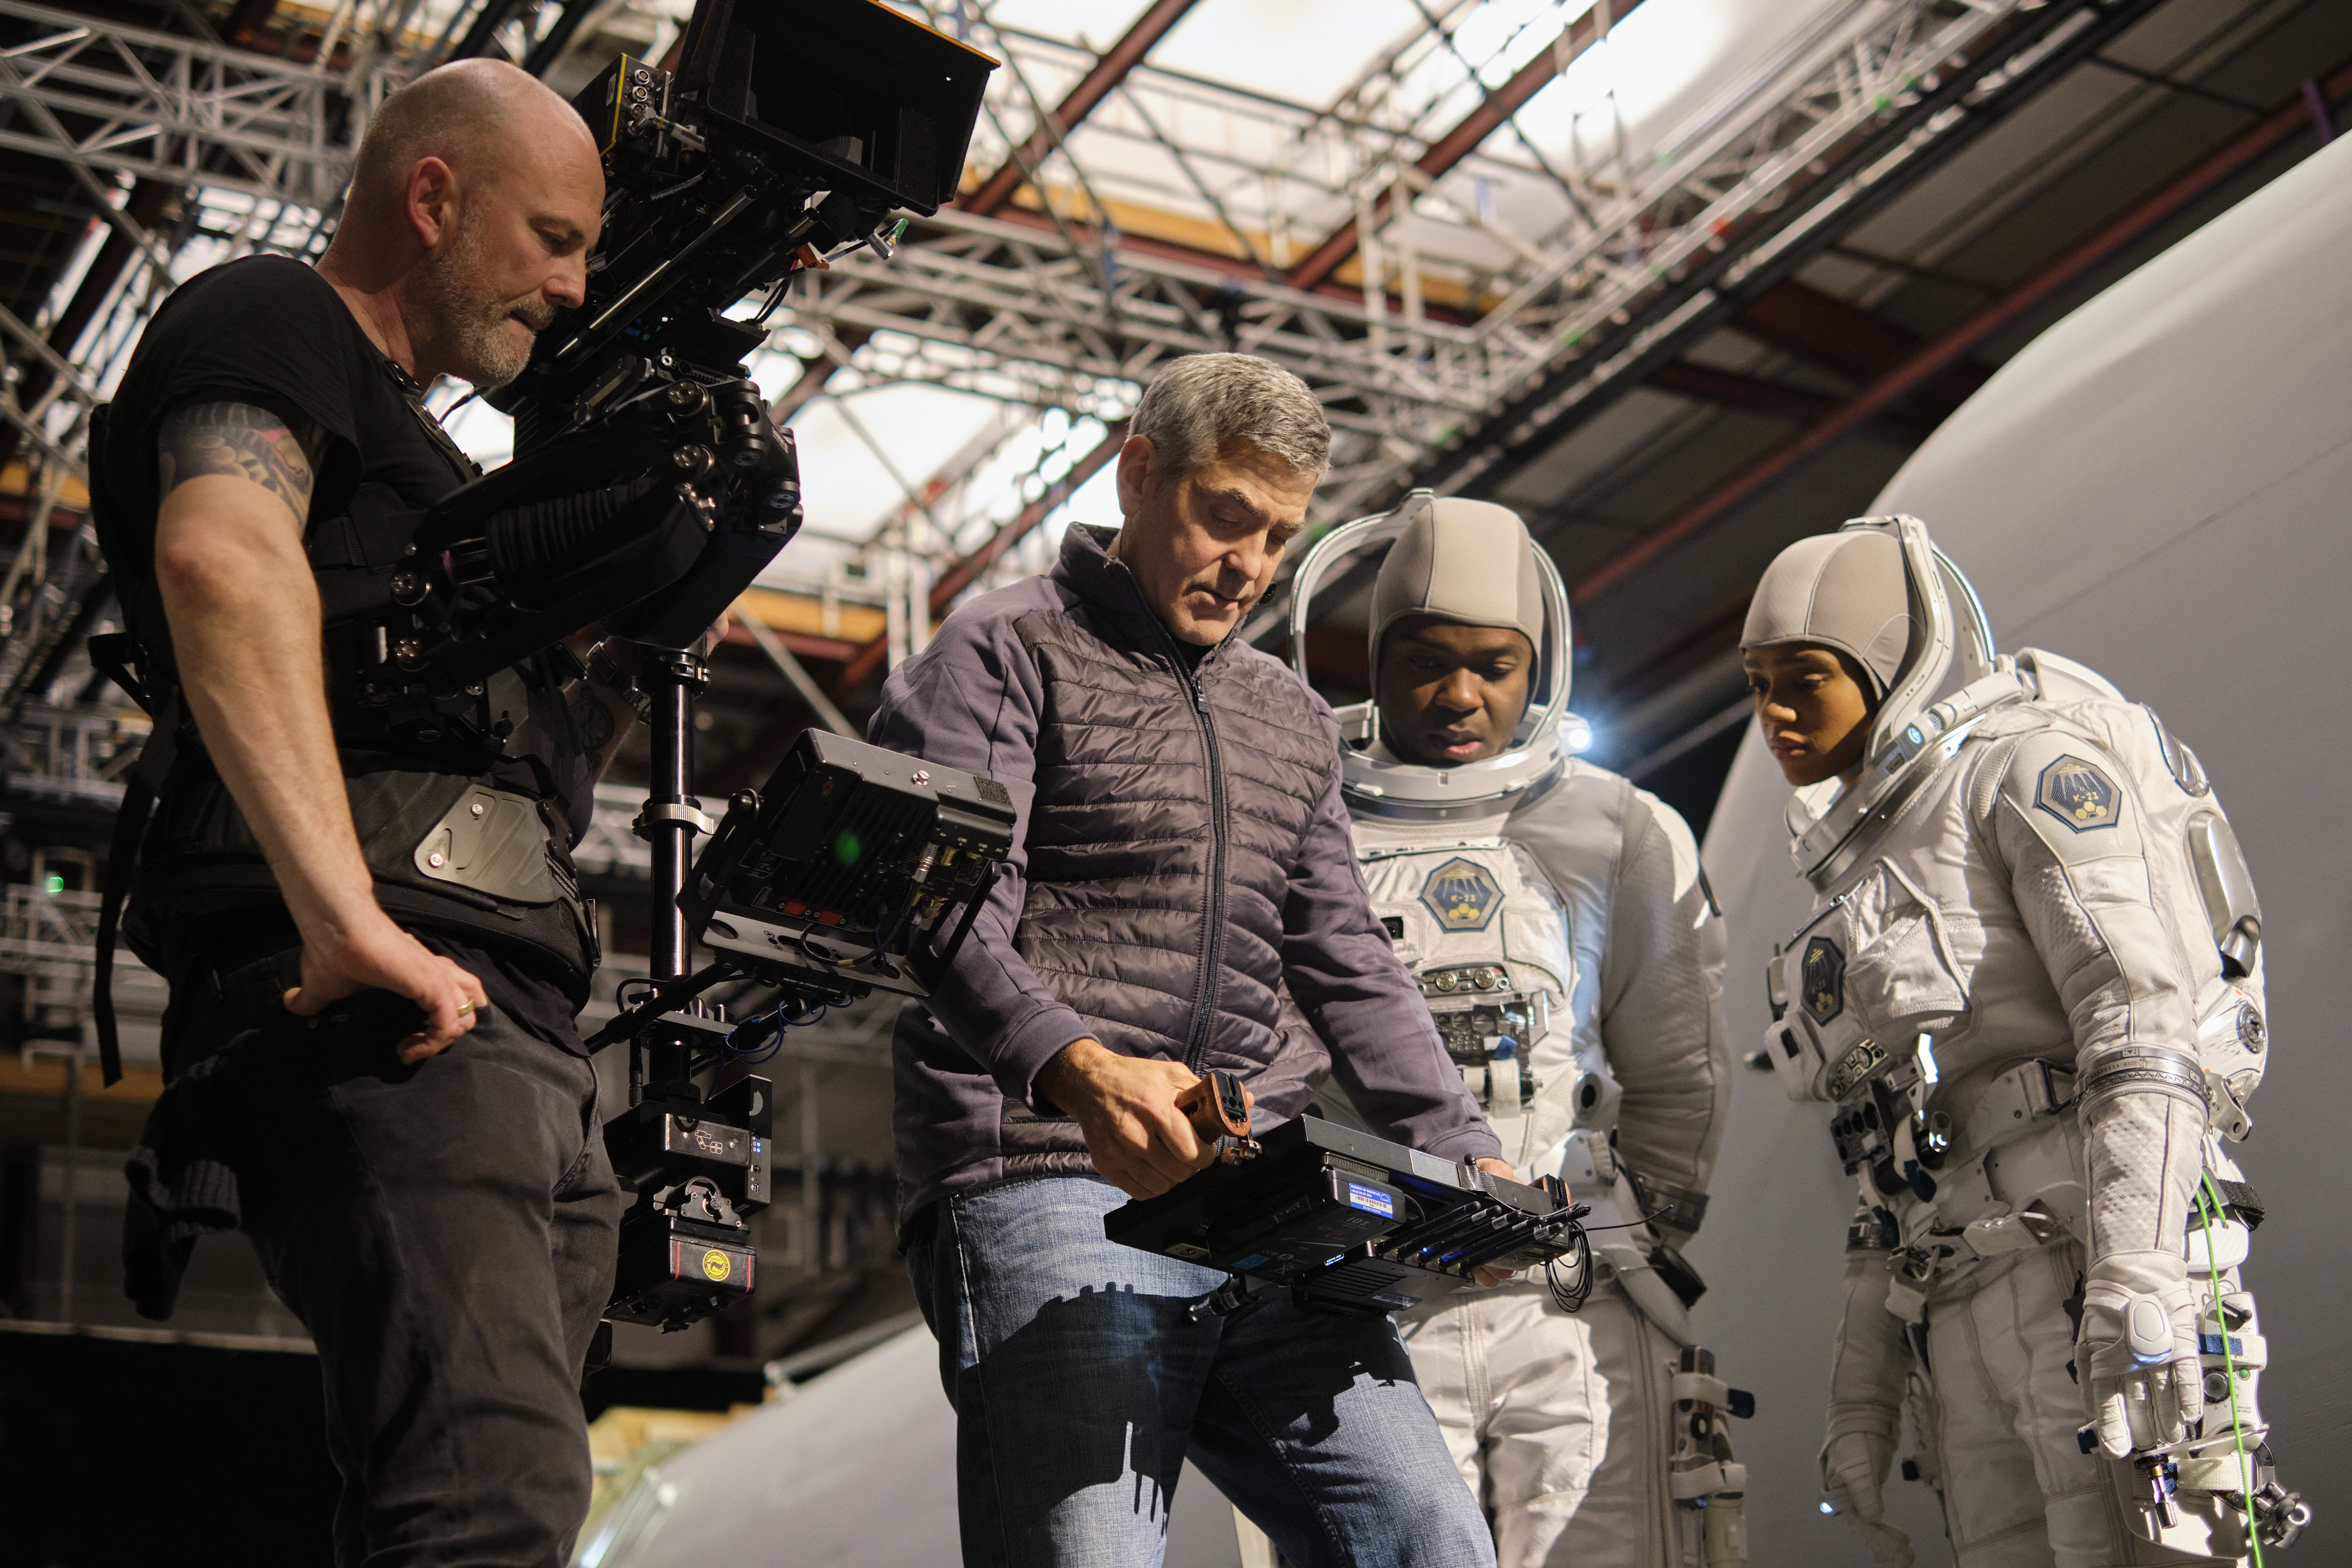 Clooney directs David Oyelowo and Tiffany Boone